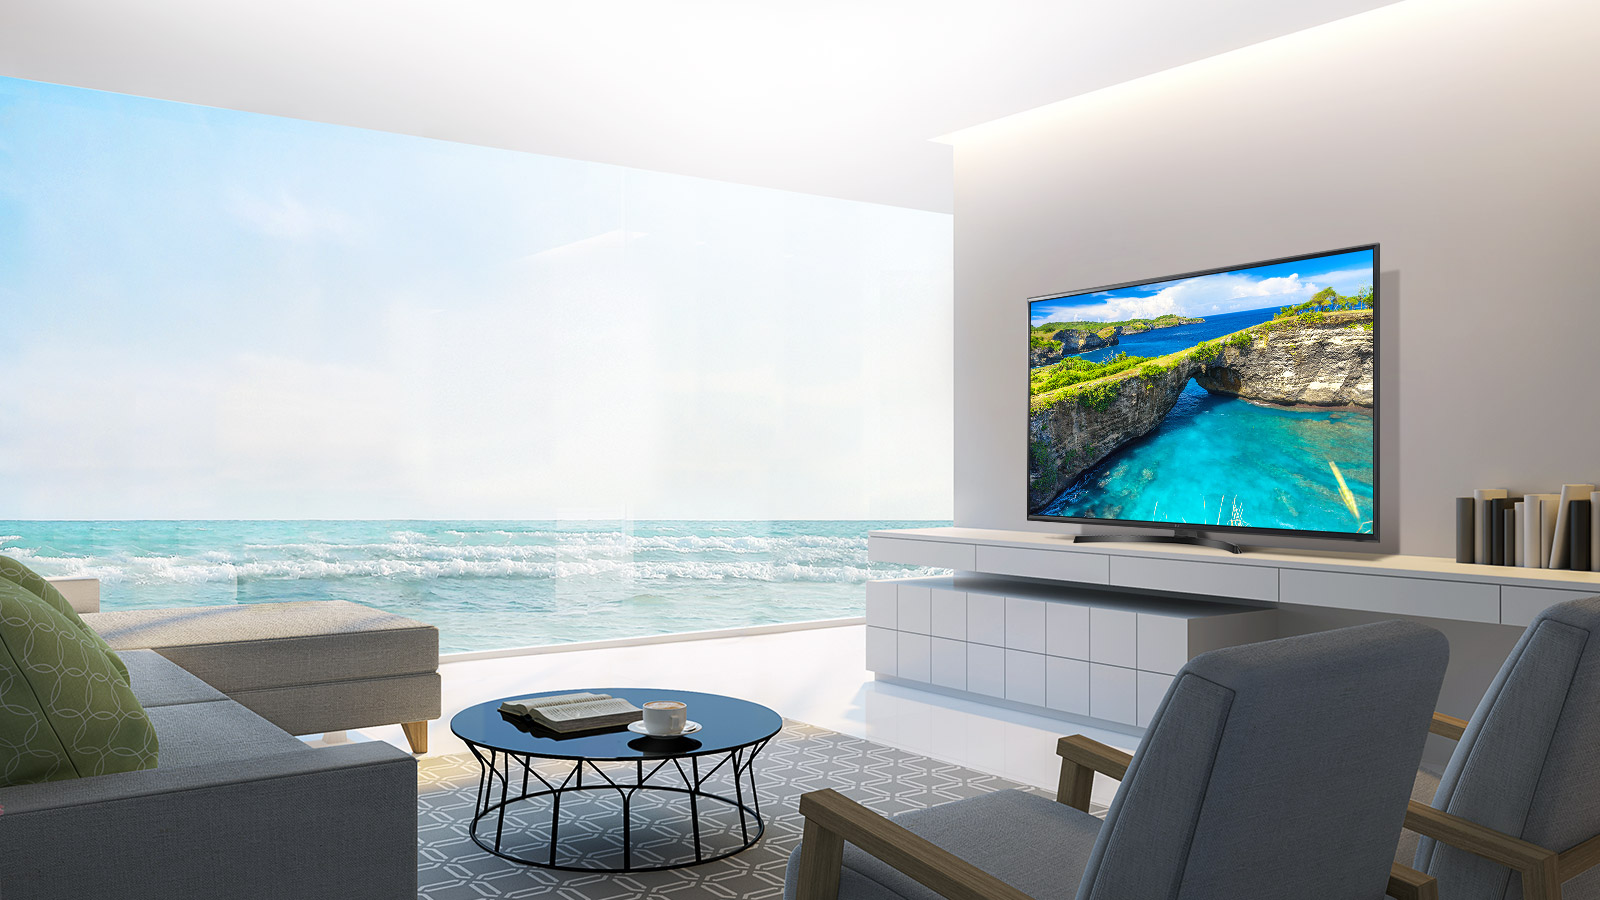 تلویزیون LED ال جی سایز 49 اینچ مدل UK6400